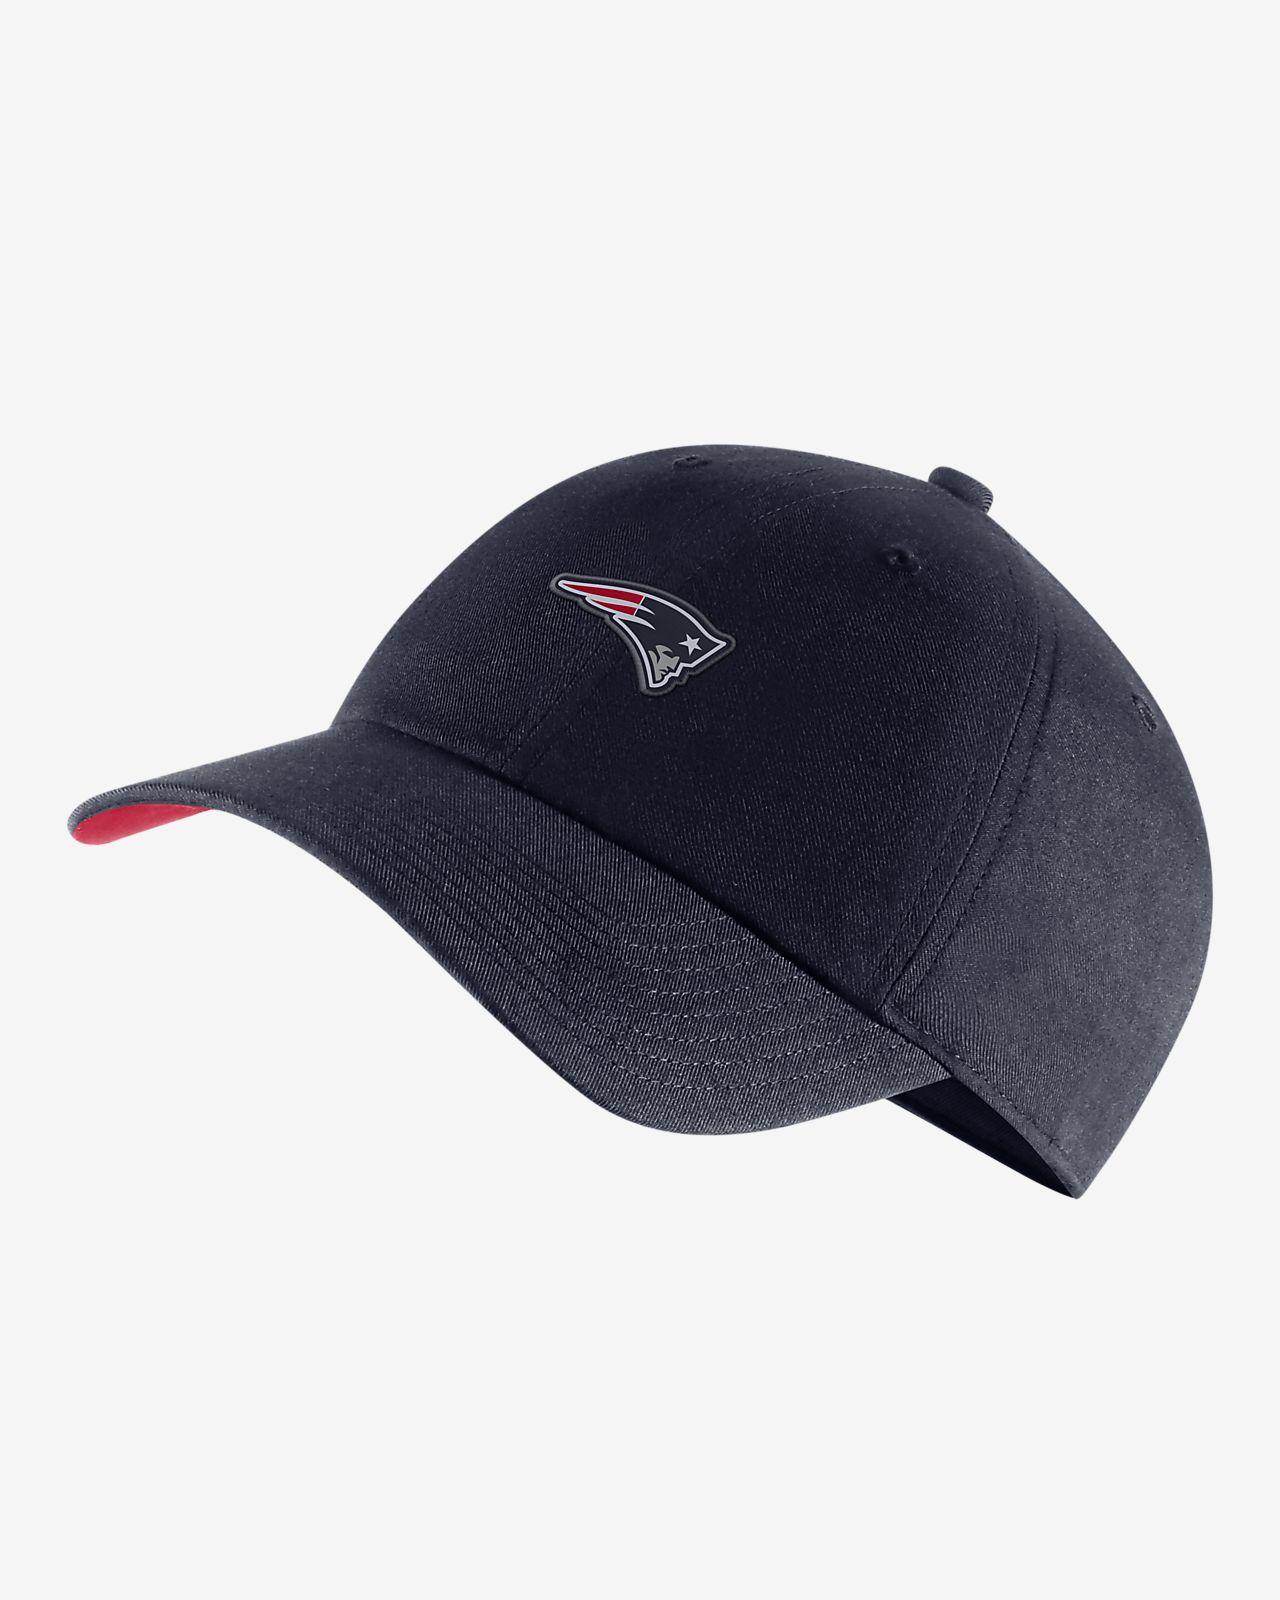 bfd871f5f67 Nike Heritage86 (NFL Patriots) Adjustable Hat. Nike.com GB